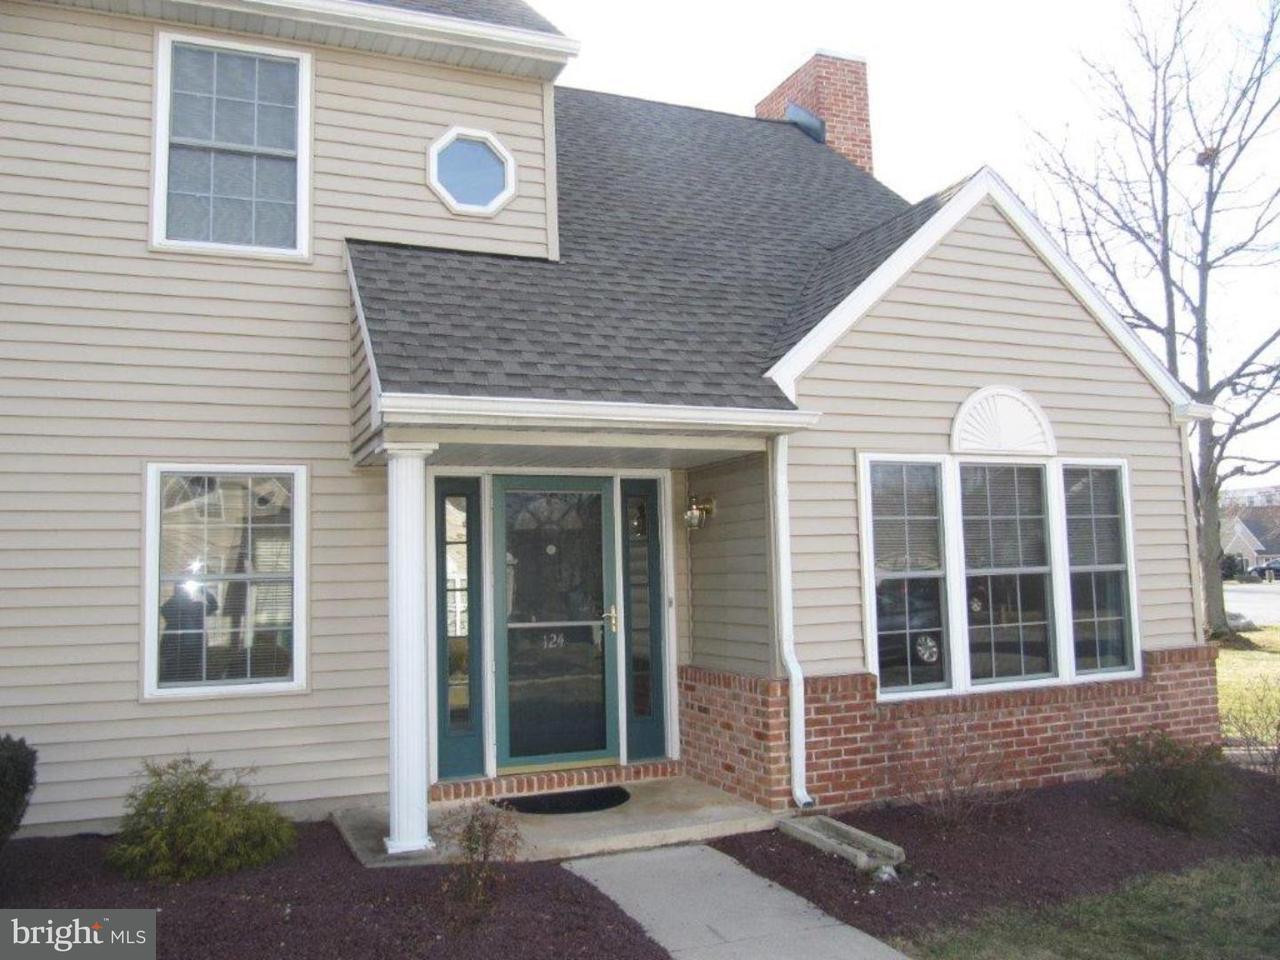 Casa unifamiliar adosada (Townhouse) por un Venta en 124 PRIMROSE Lane Reading, Pennsylvania 19610 Estados Unidos